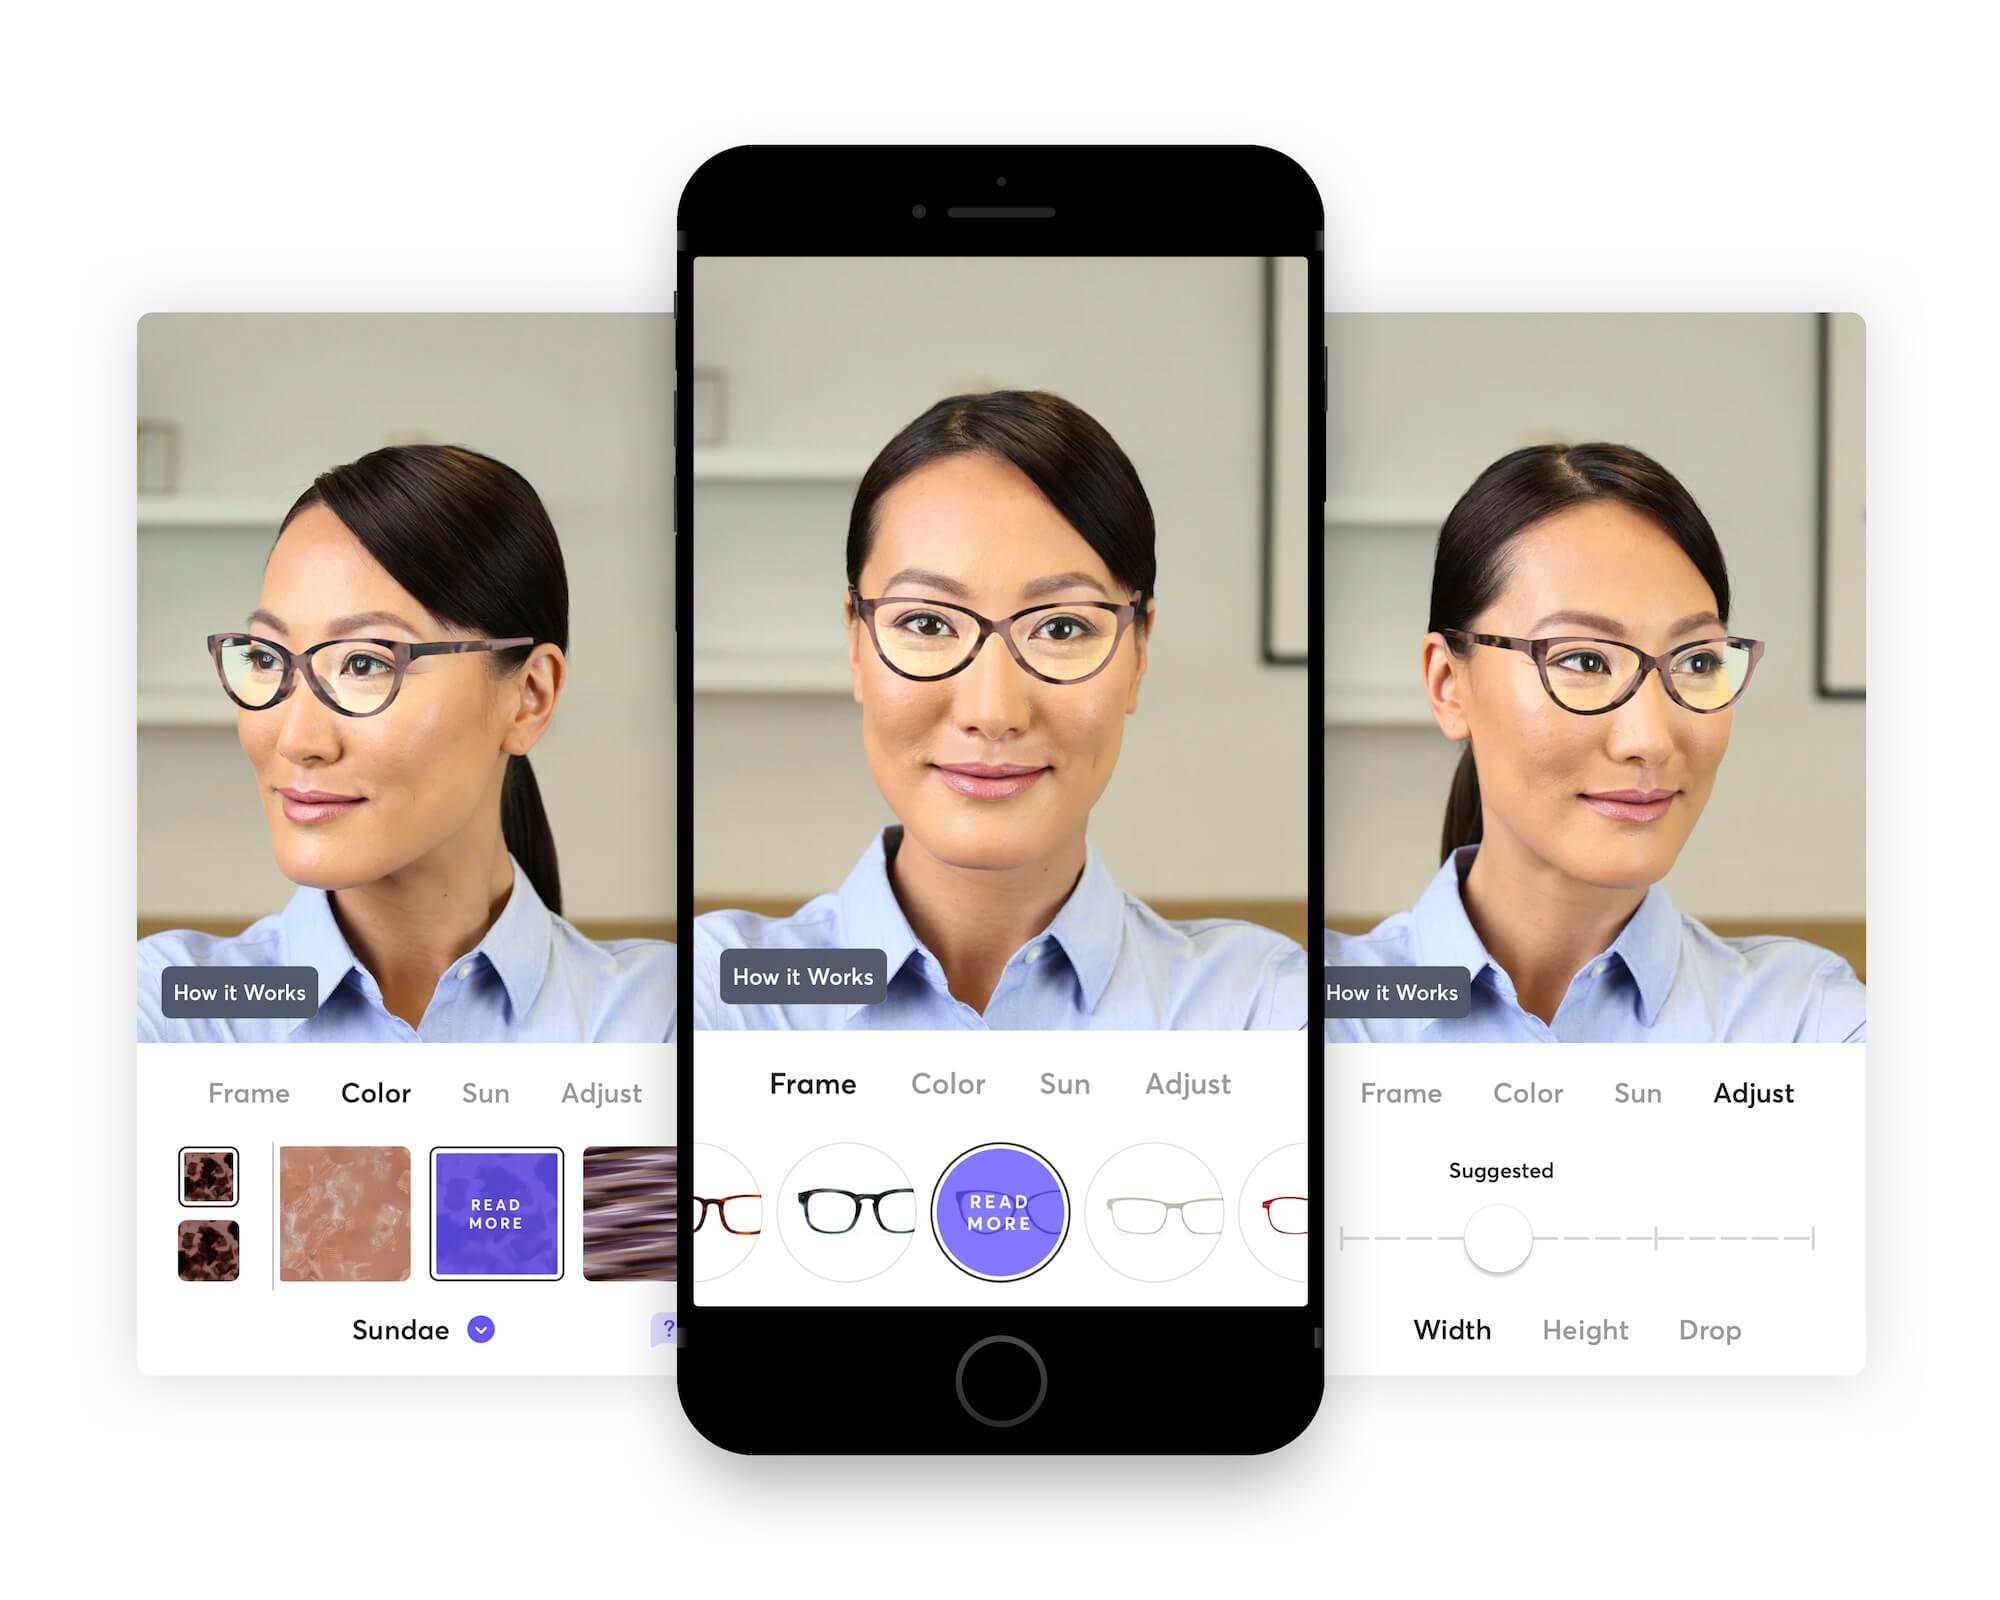 Bespoke eye glasses fitting in Topology iPhone app